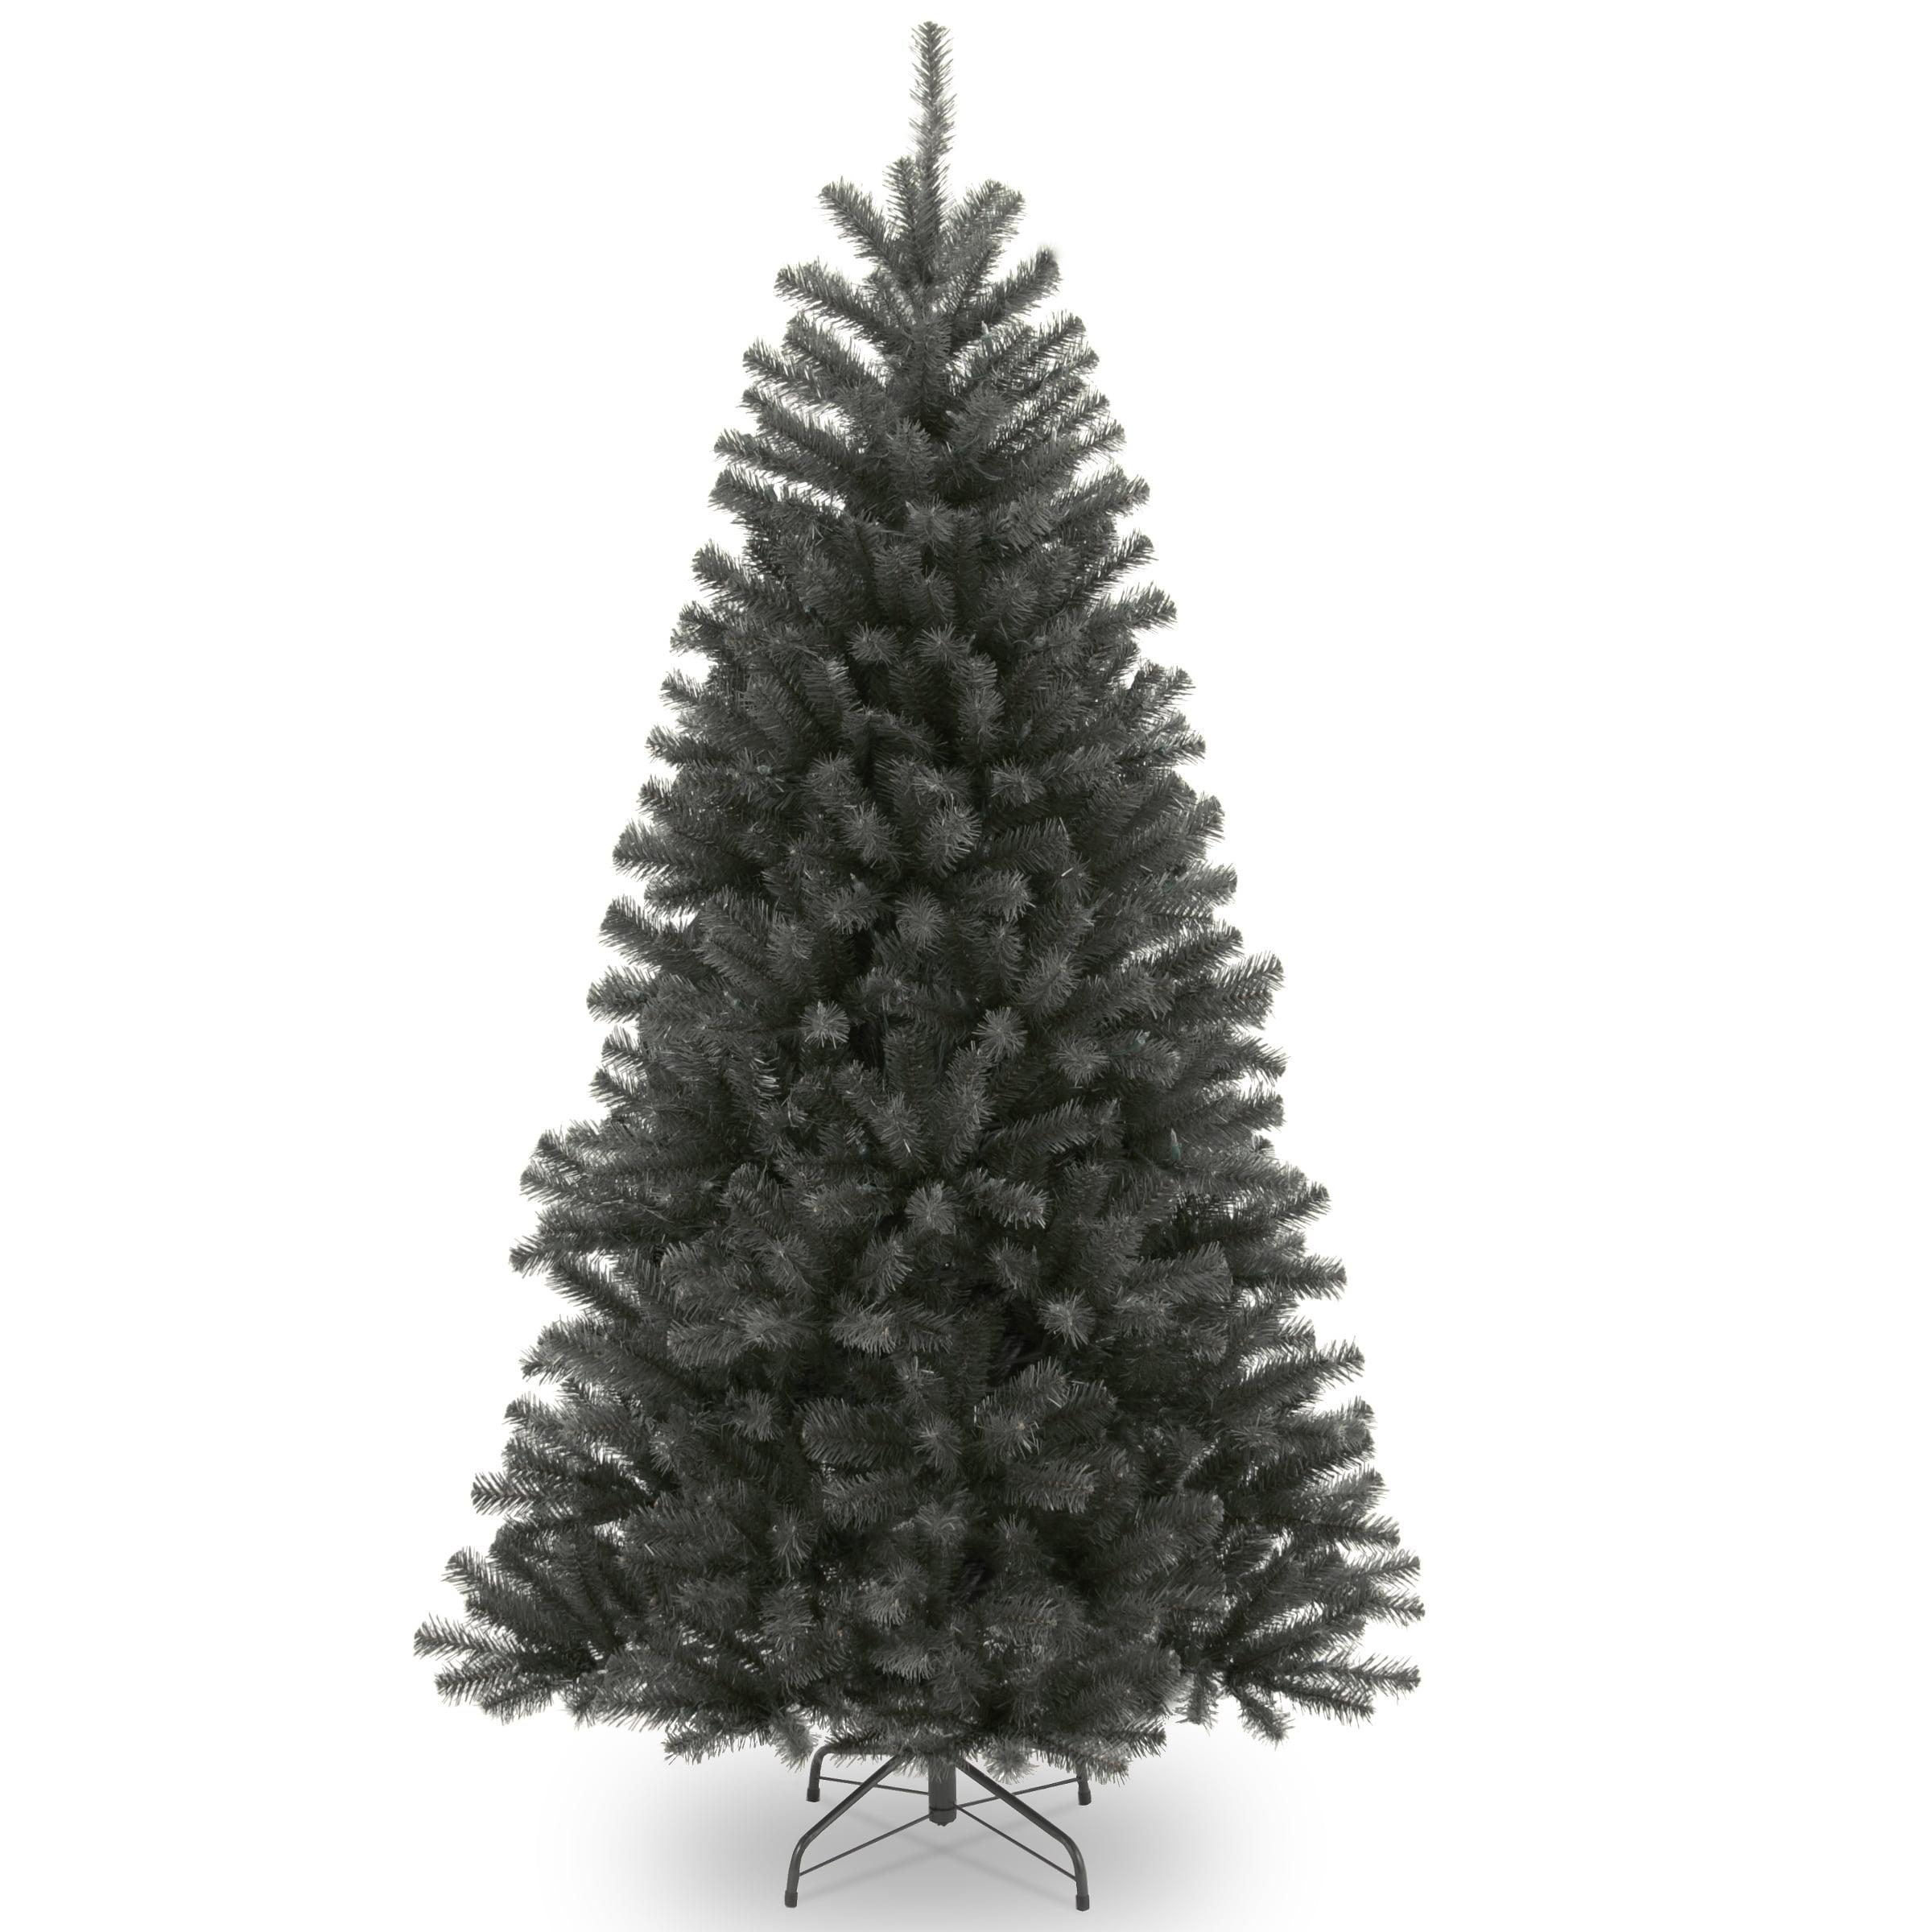 National Tree Company 6.5 ft. North Valley® Black Spruce Tree